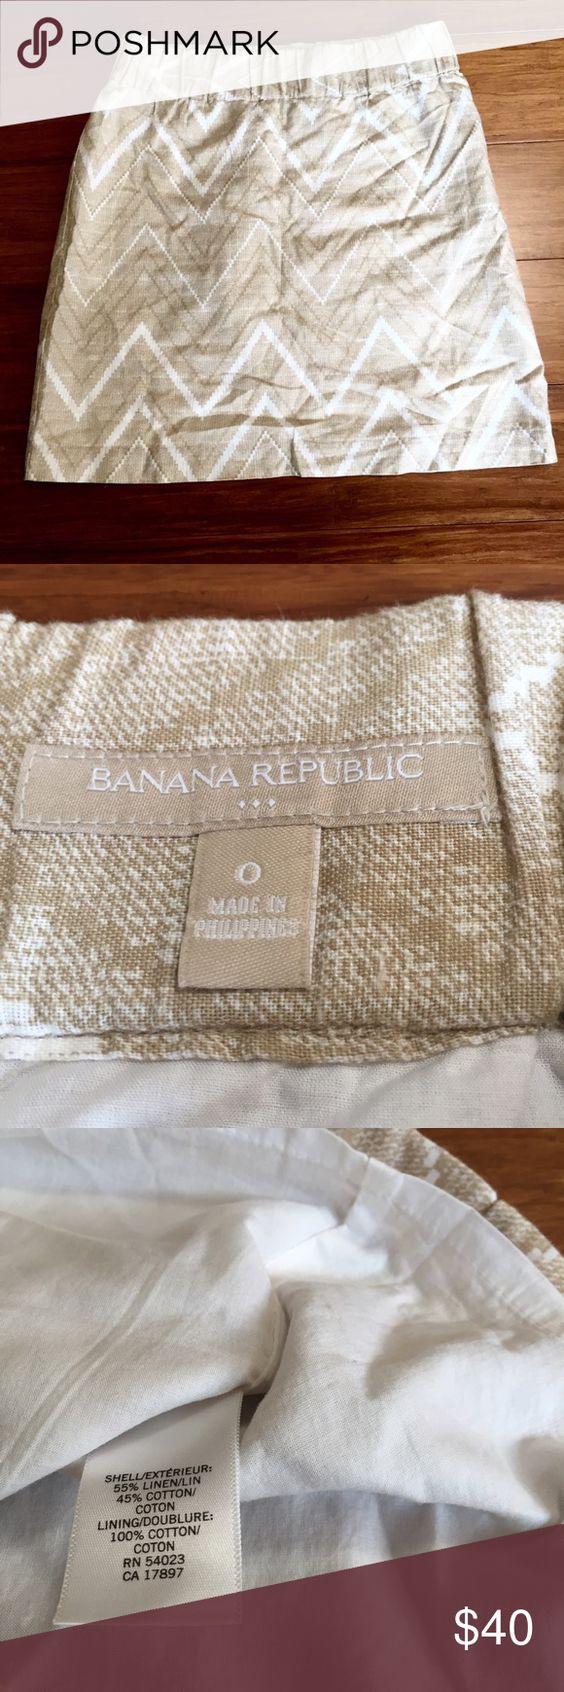 "Chevron Linen Mini Skirt Linen/Cotton blend. 14"" waist flat across, 19"" hips flat across, 18"" length. Lined. EUC No rips or stains.  ✳️Ask about custom bundles for better discount. Offers welcome✳️ Banana Republic Skirts Mini"